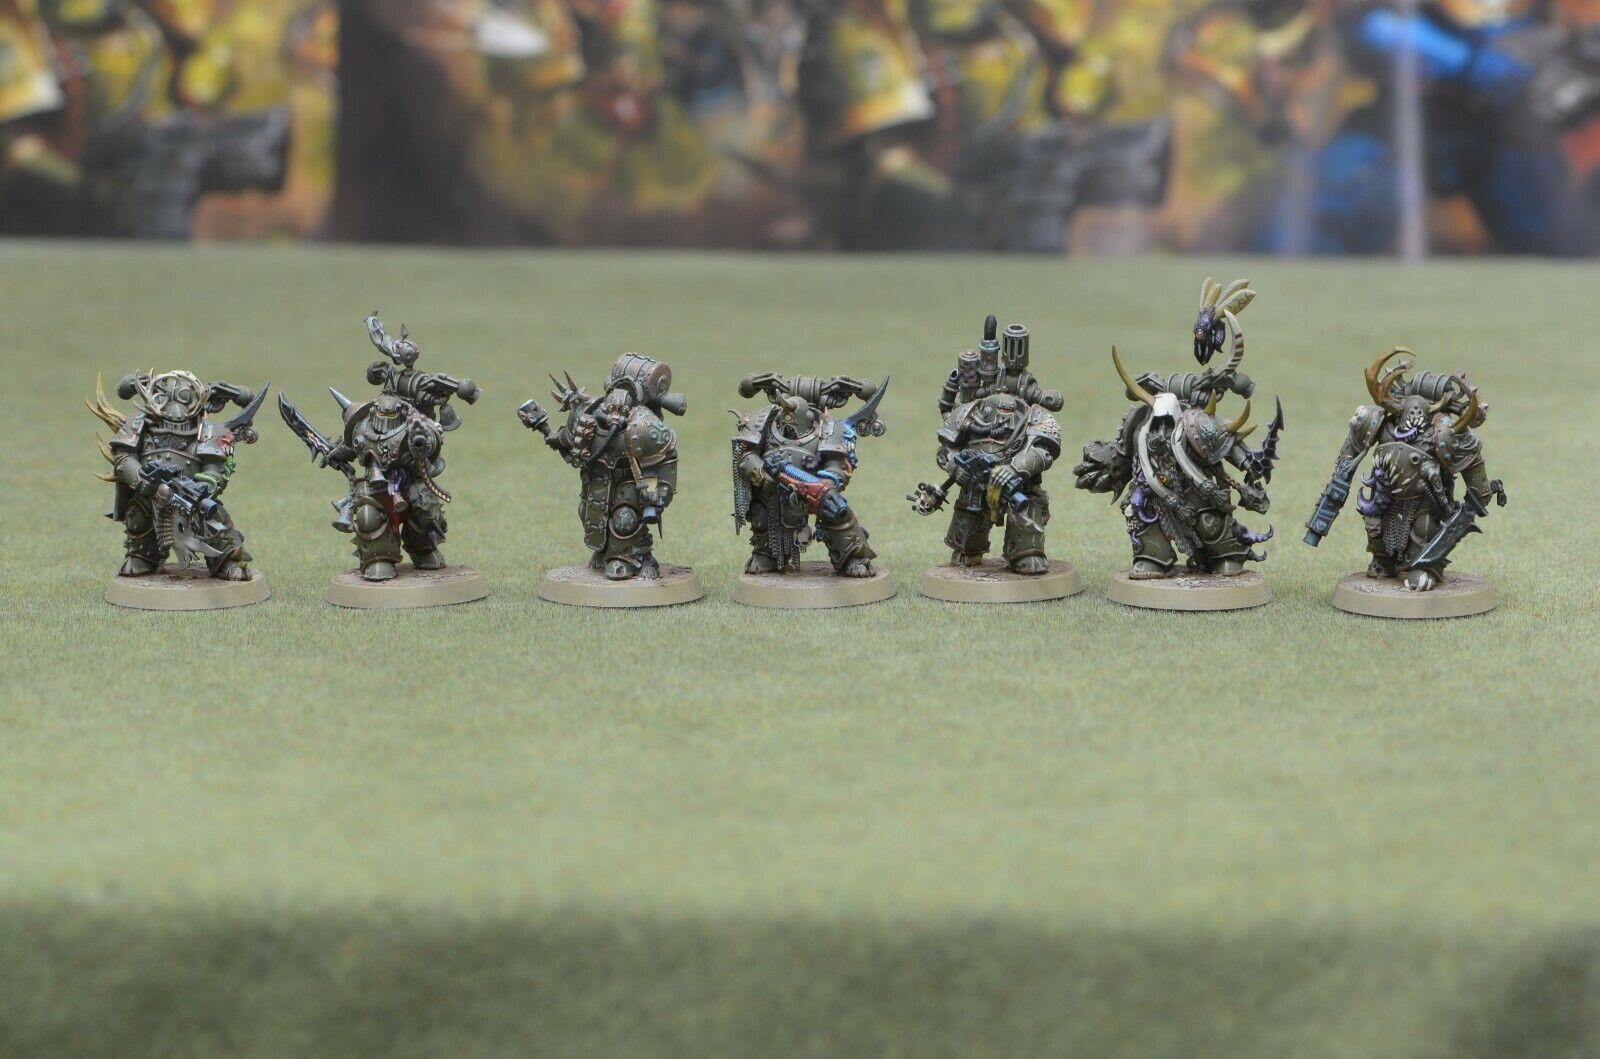 Warhammer 40K caos spacemarines muerte Guardia Marines de Plaga